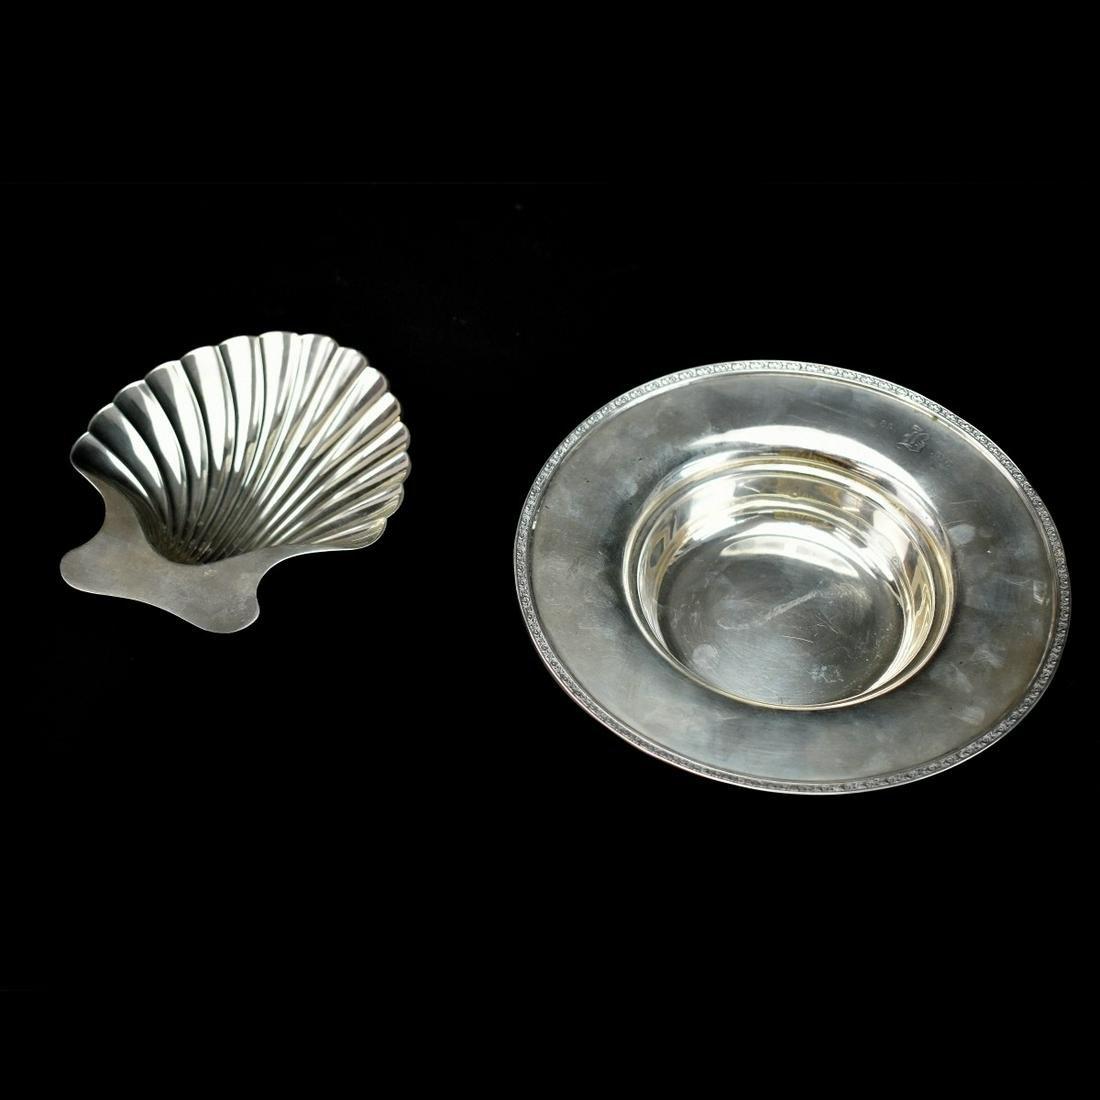 Tiffany & Co. Sterling Silver Tableware